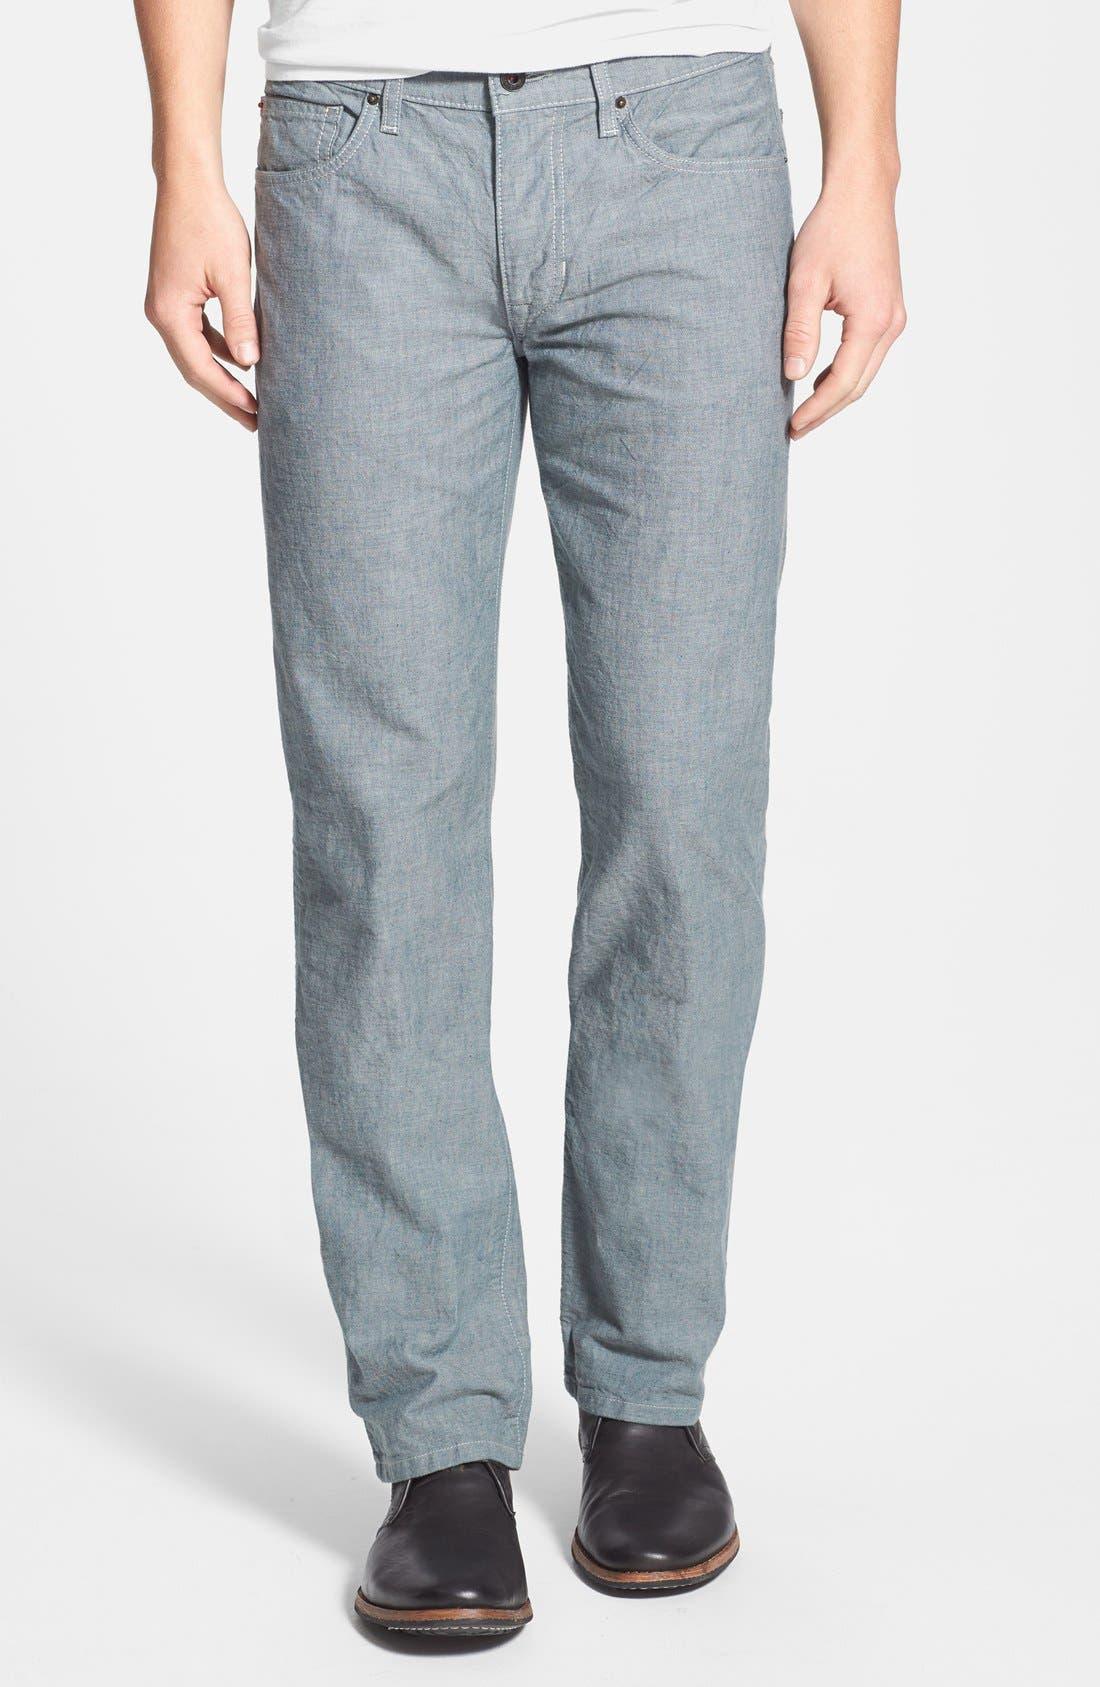 Alternate Image 1 Selected - Joe's 'Brixton' Slim Fit Canvas Denim Jeans (Sidewalk)